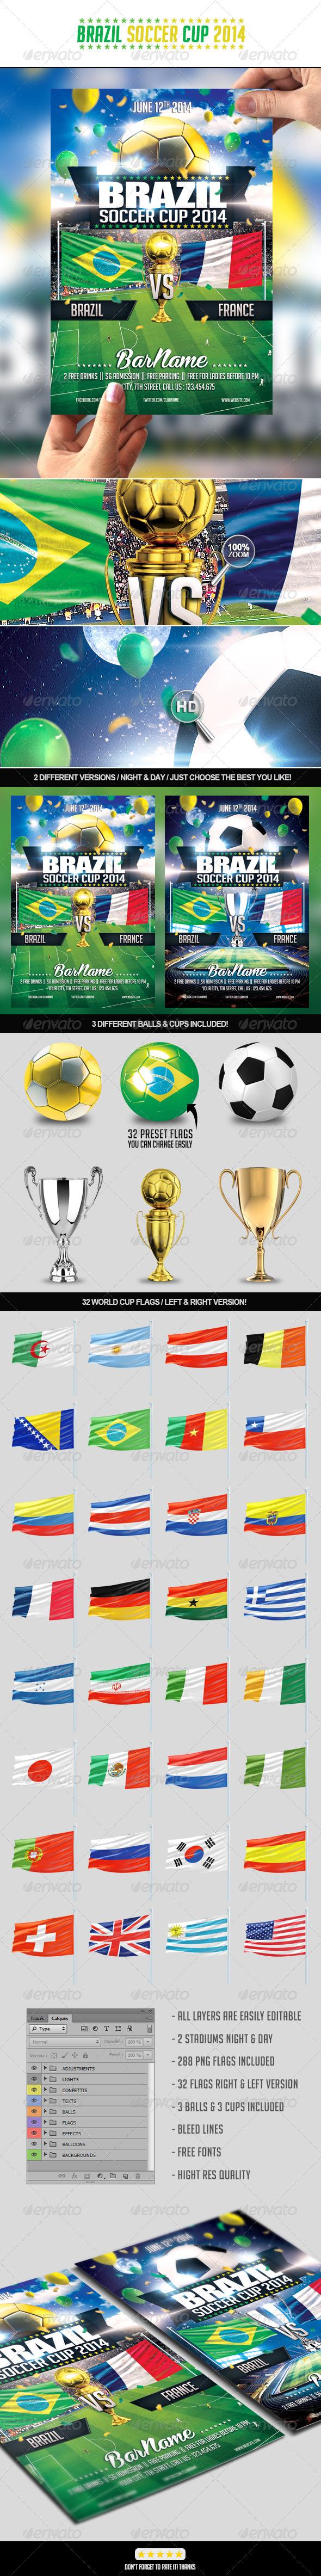 GraphicRiver Brazil Soccer Cup 2014 7544452